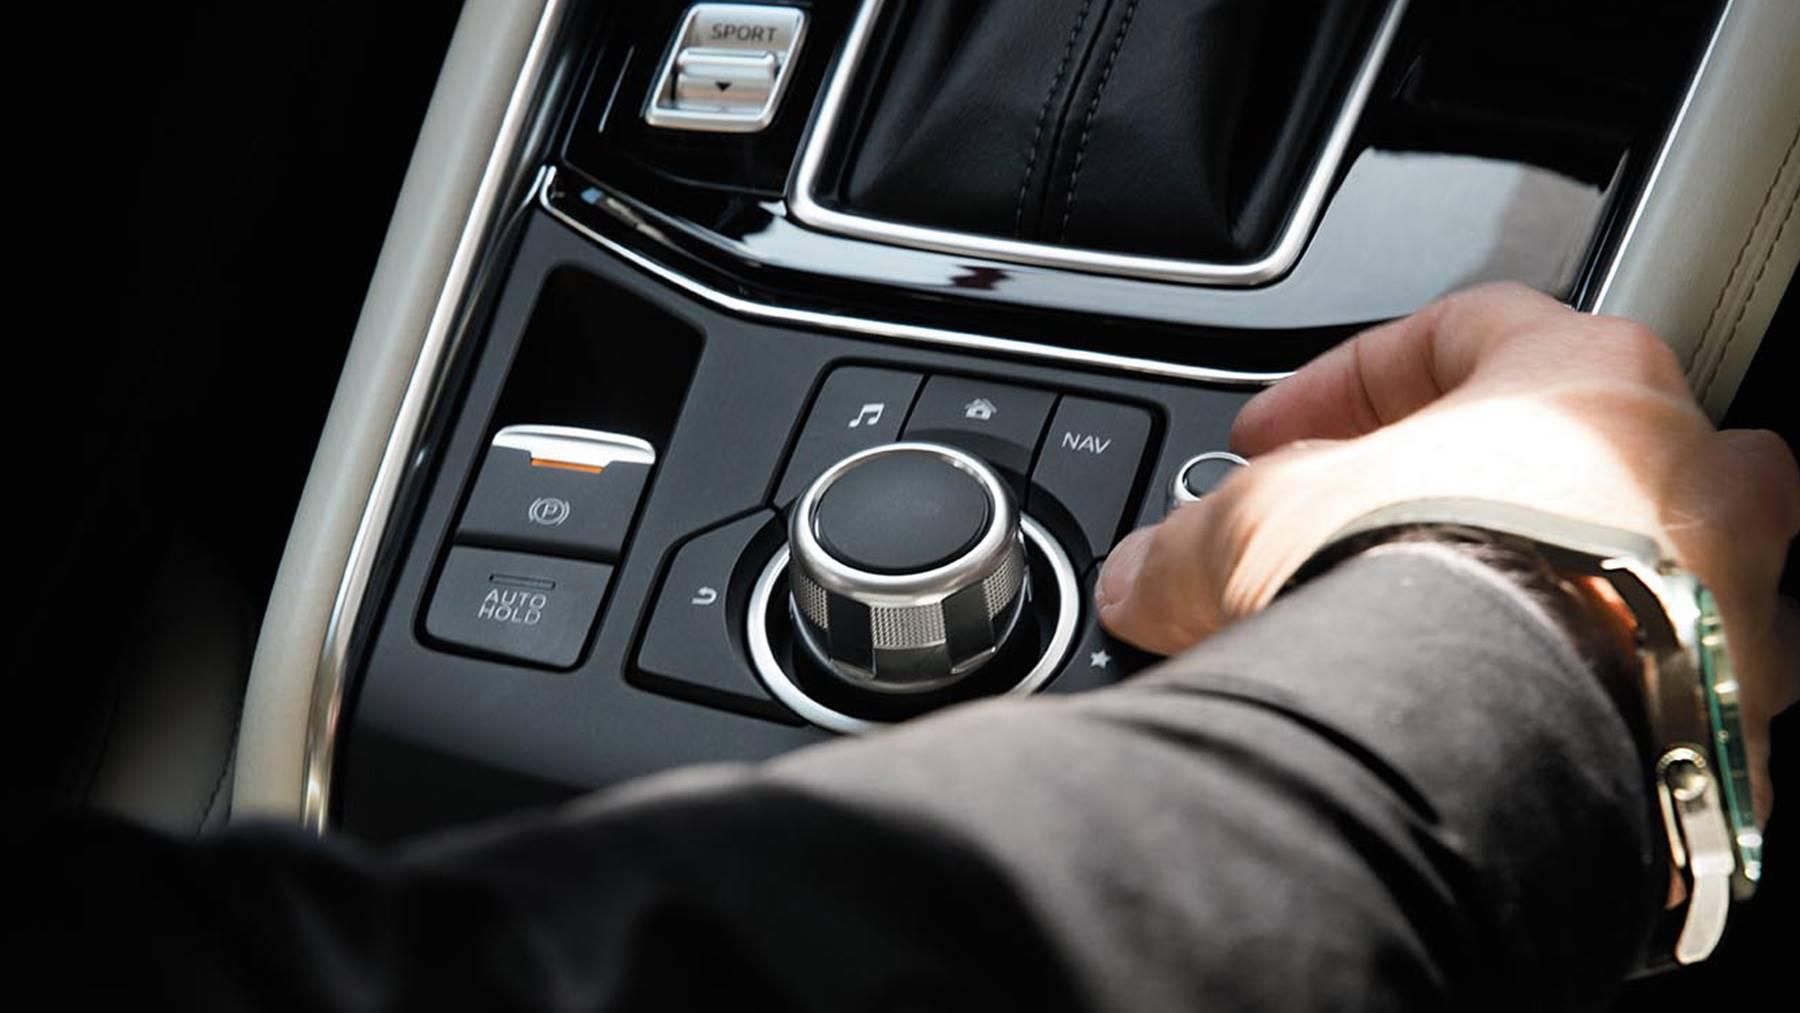 2019 Mazda CX-5 Instrument Panel